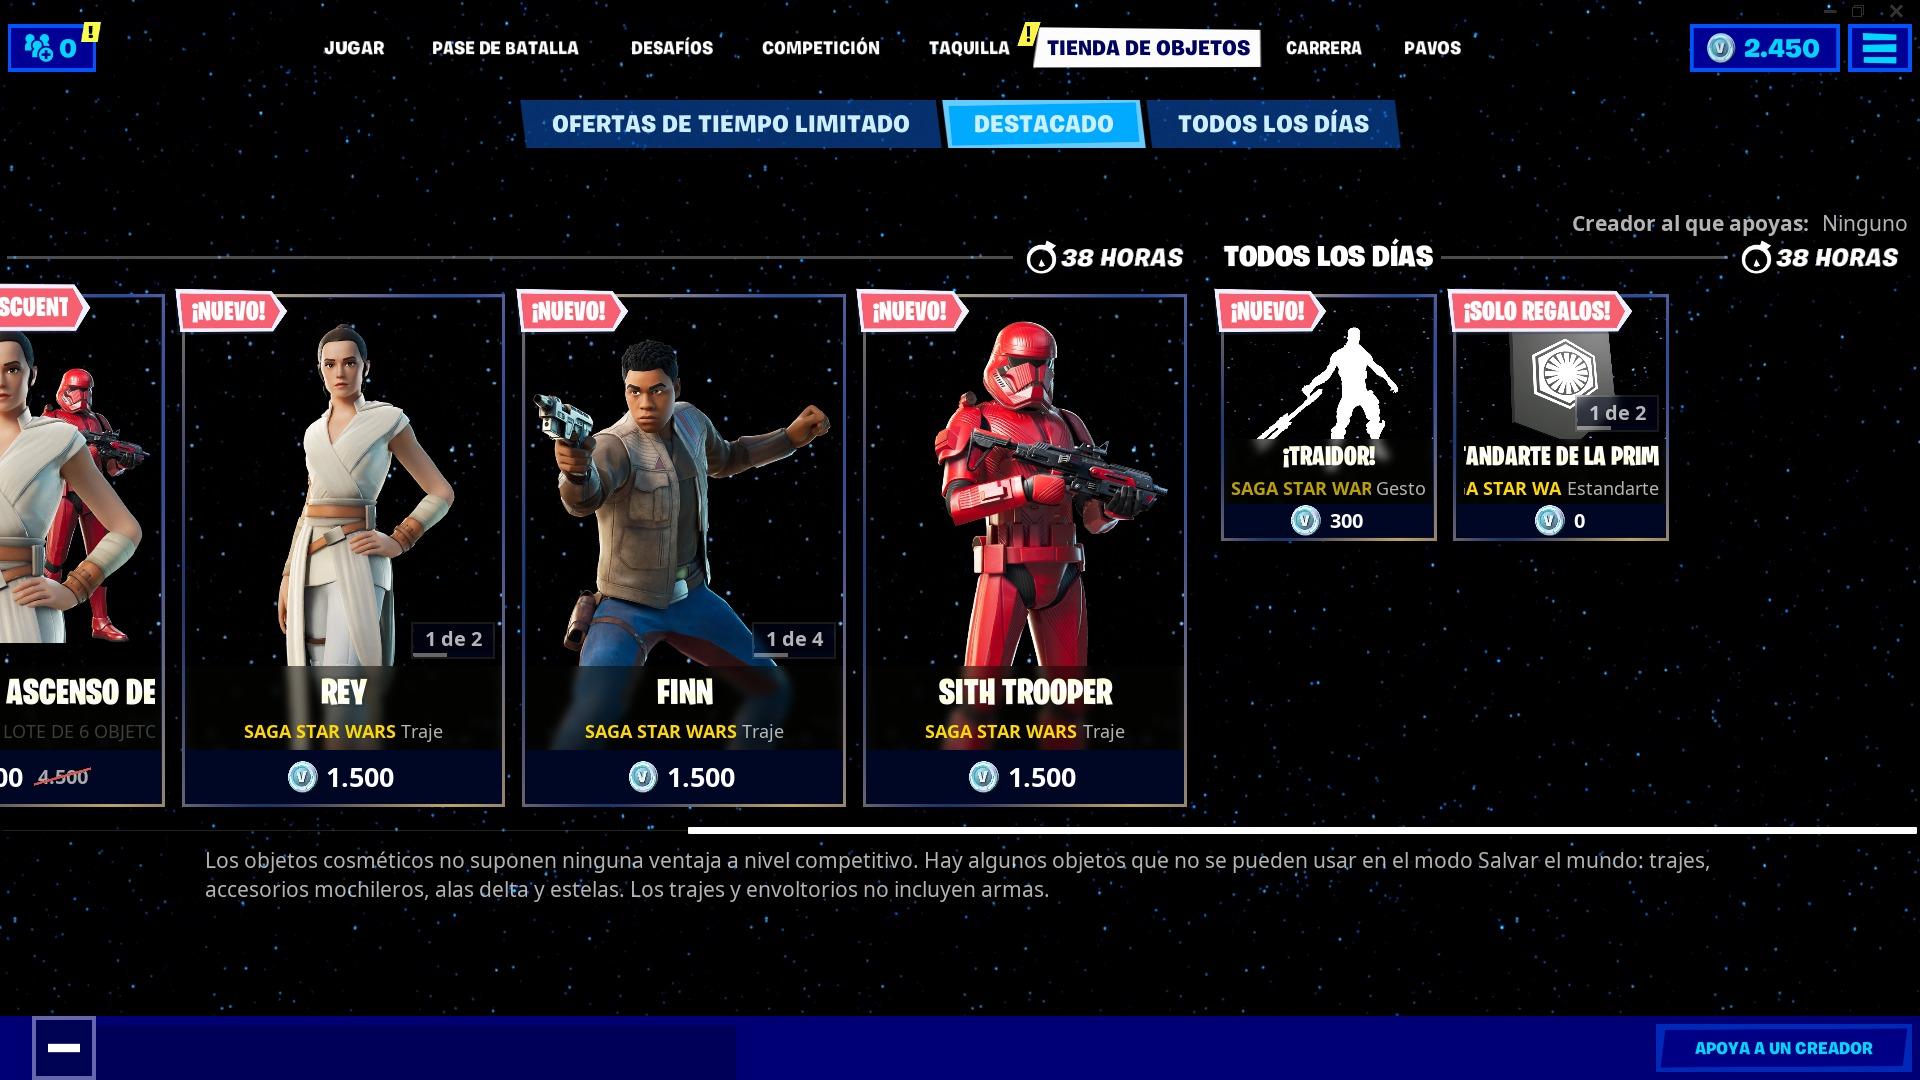 skins-star-wars-fortnite